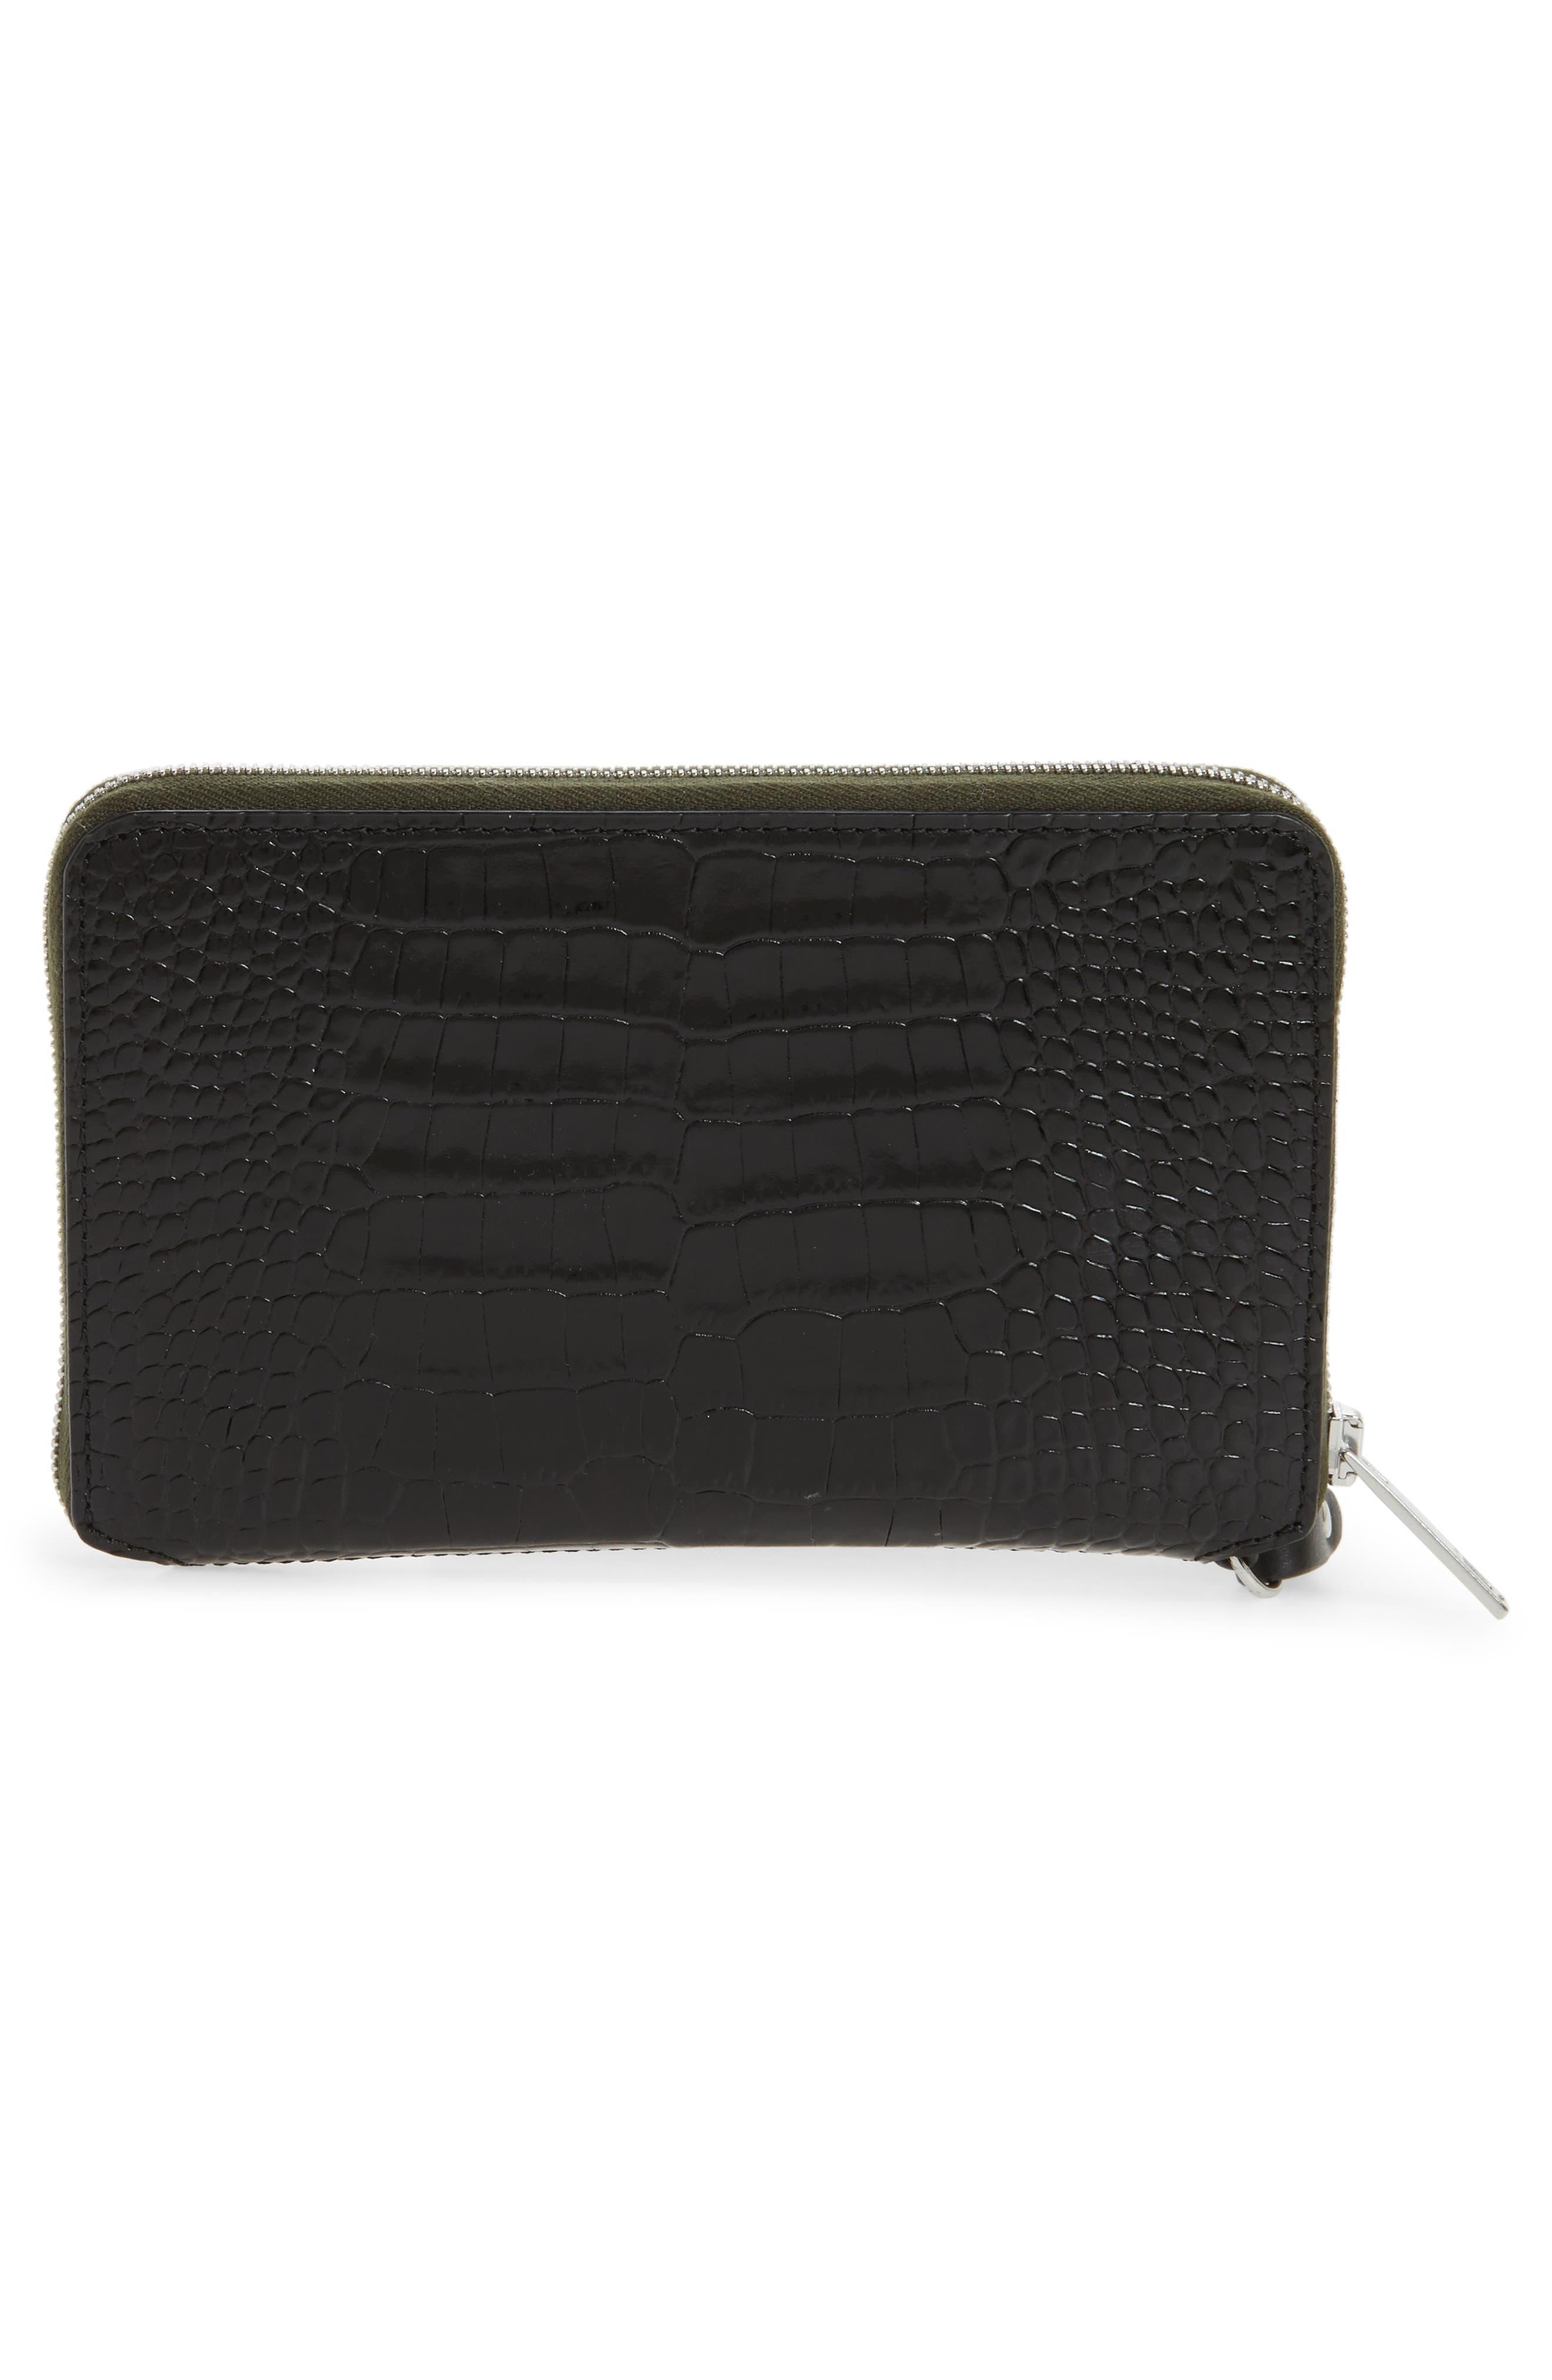 Croc Embossed Leather Smartphone Wallet,                             Alternate thumbnail 4, color,                             Black Croco